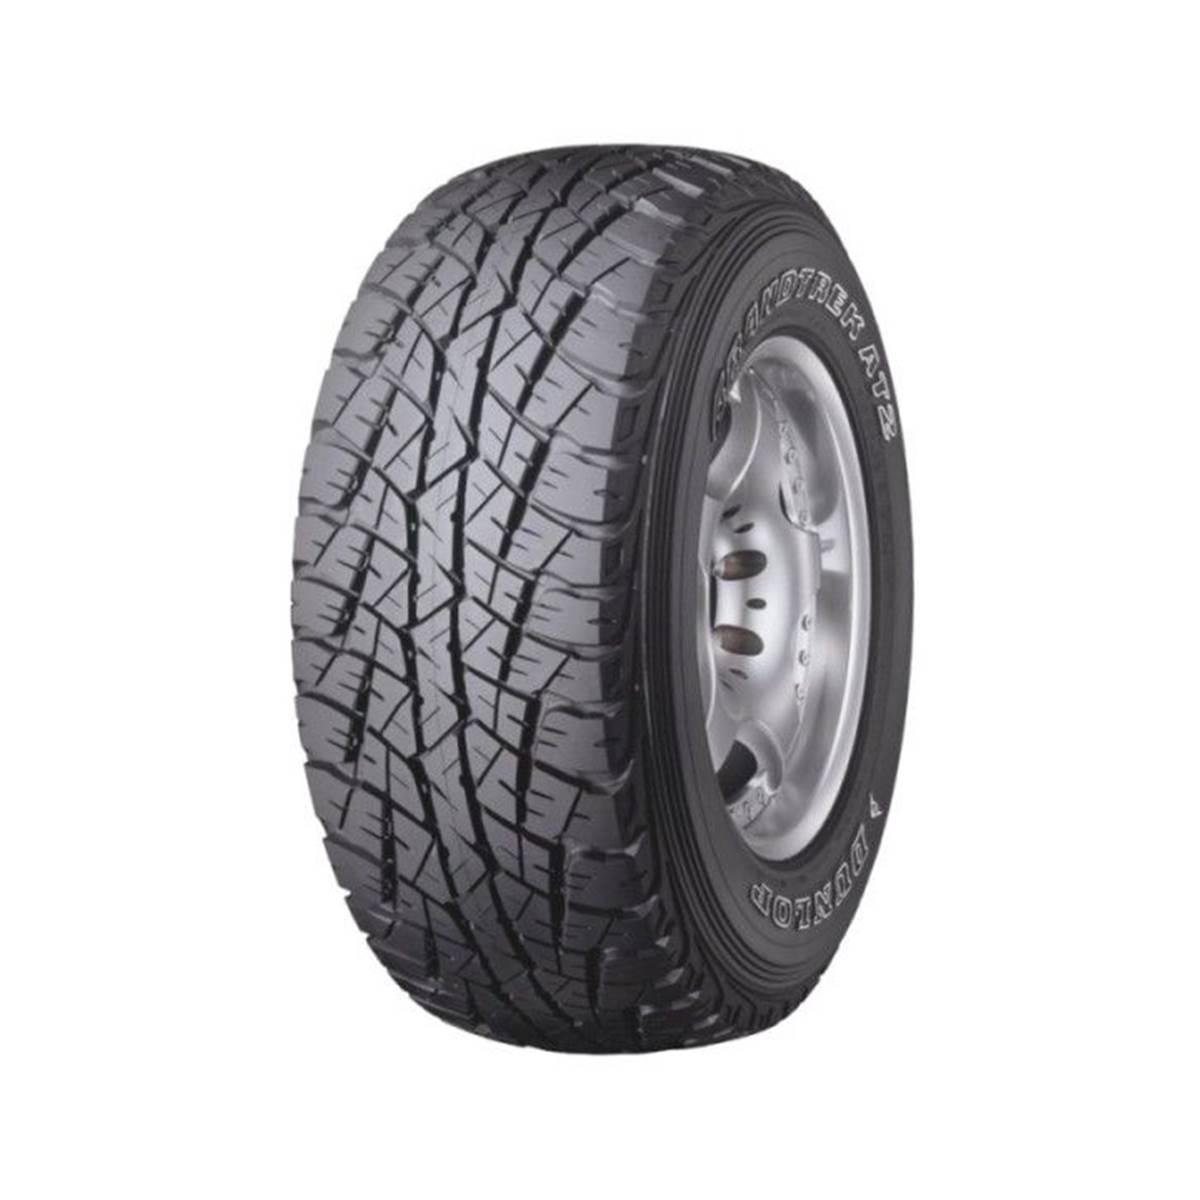 pneu dunlop grandtrek st20 moins cher sur pneu pas cher. Black Bedroom Furniture Sets. Home Design Ideas